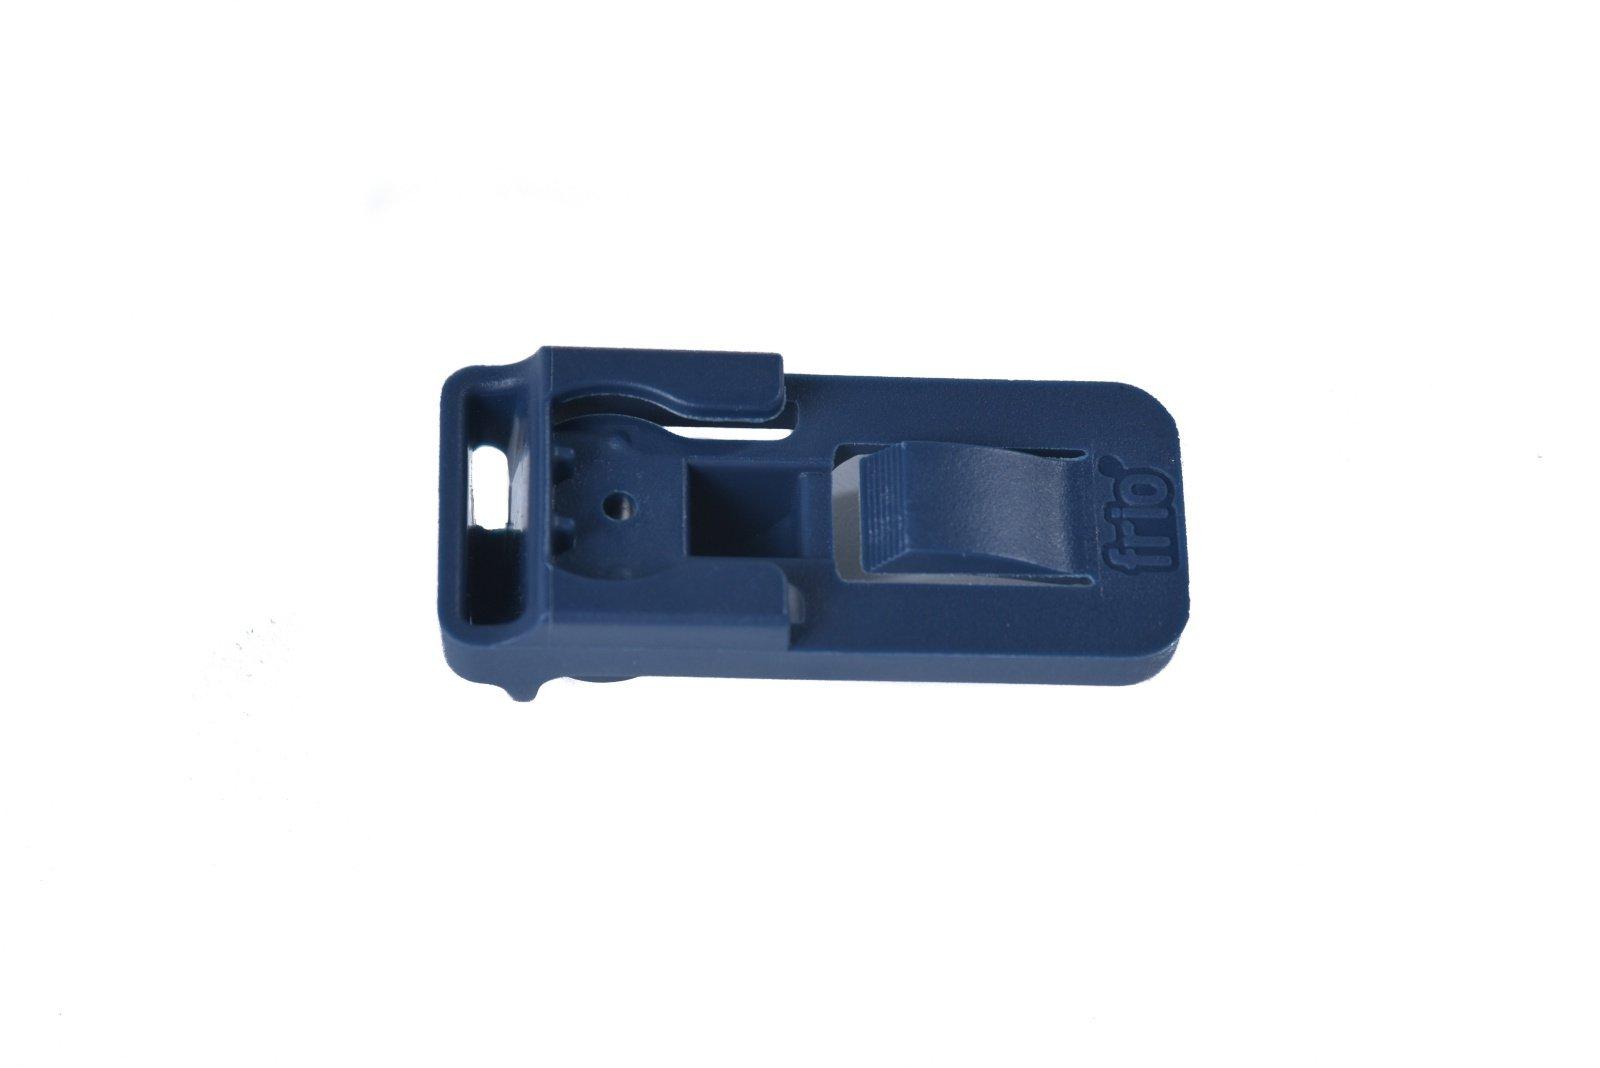 Frio V2 Universal Locking Cold Shoe Mount